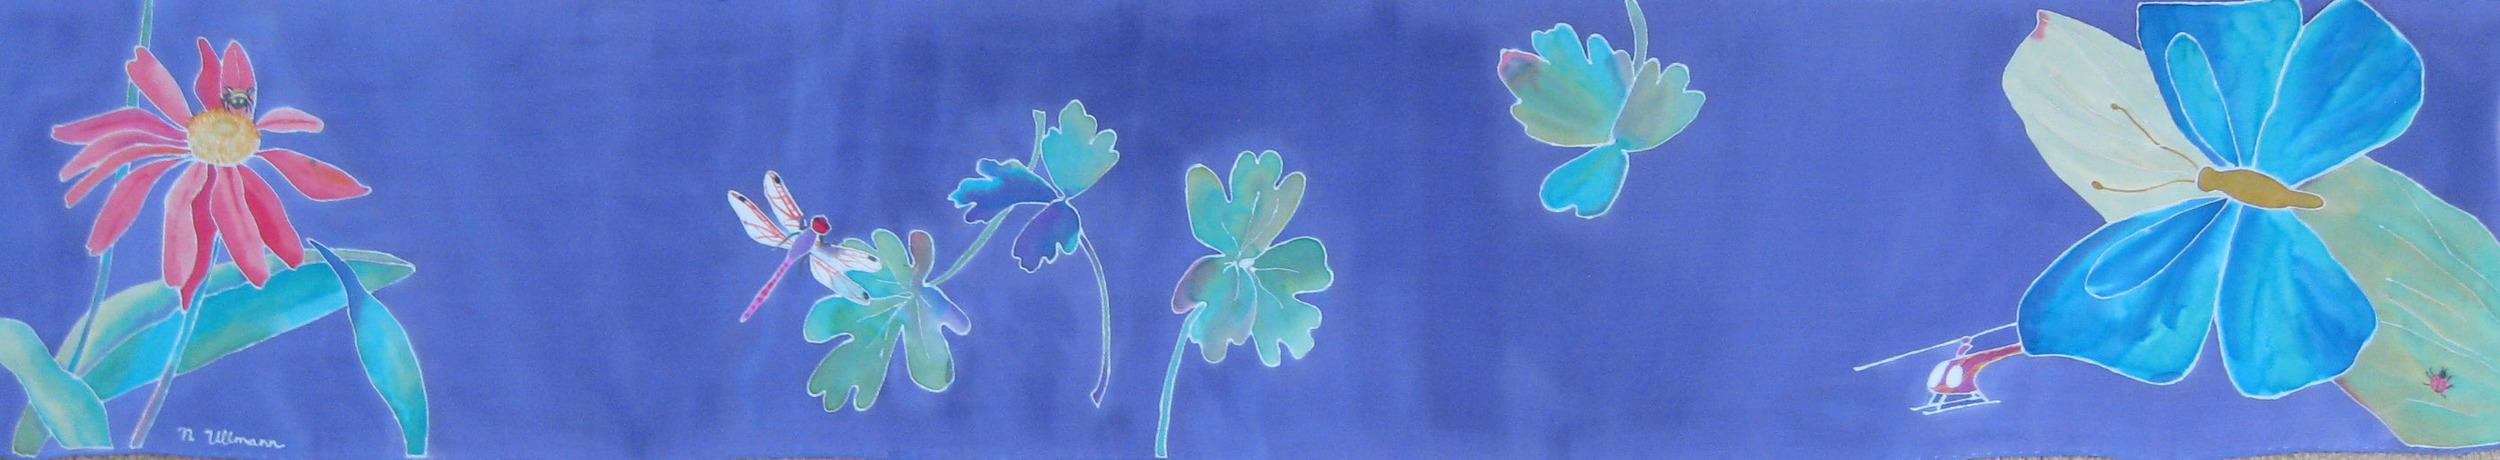 Silk painting by Nancy Ullmann